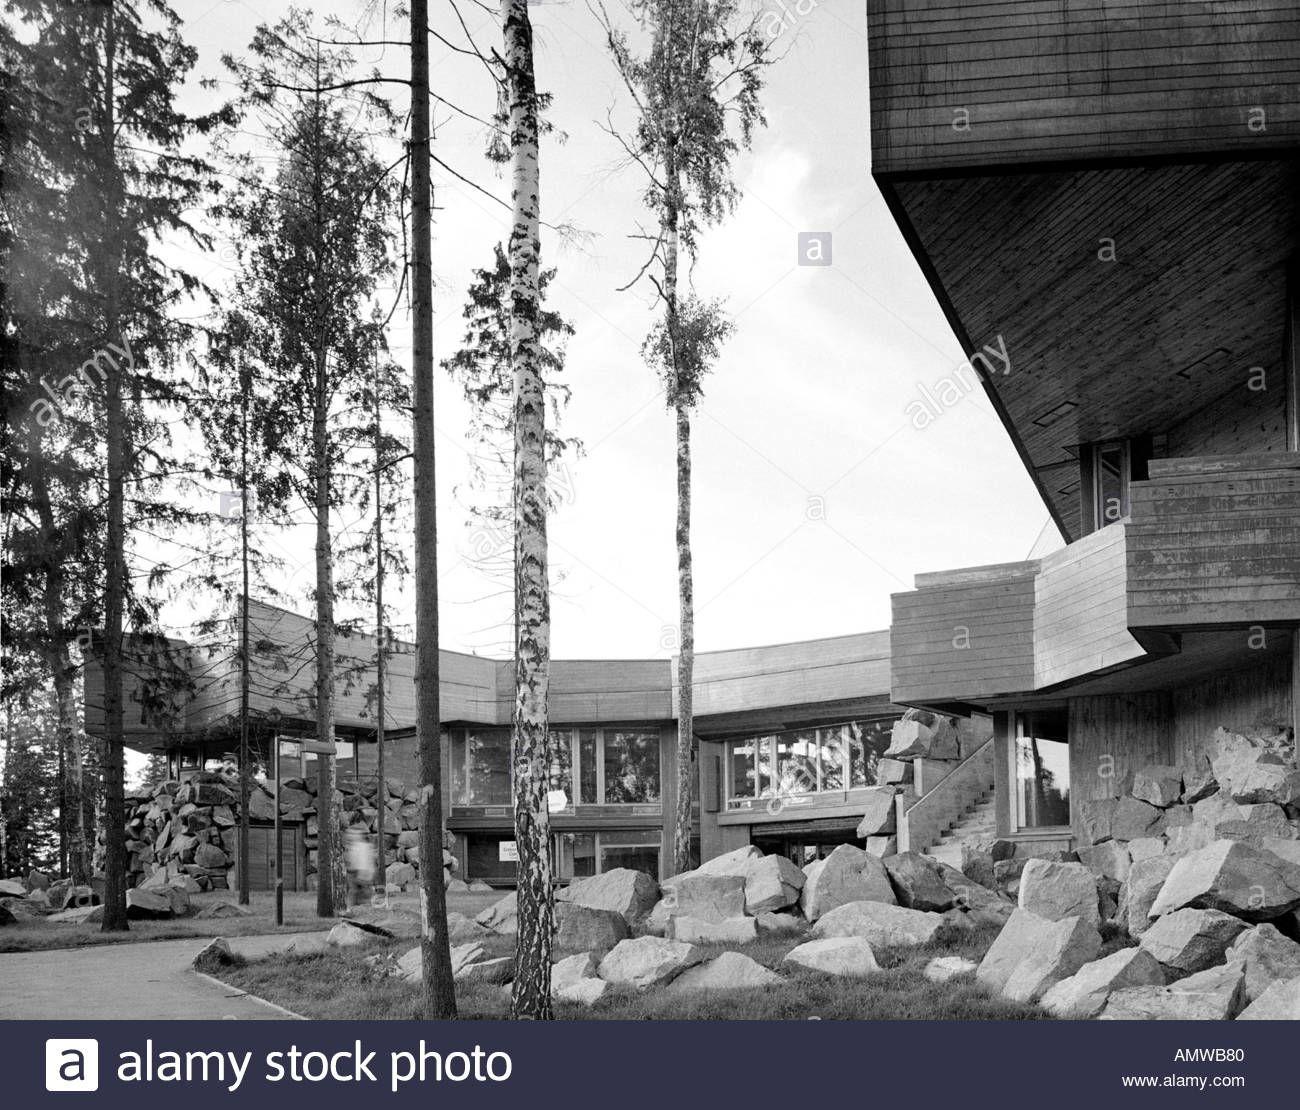 Dipoli Student Centre, Otaniemi, Helsinki, 1966. Exterior. Architect: Reima Pietilä and Raili ...